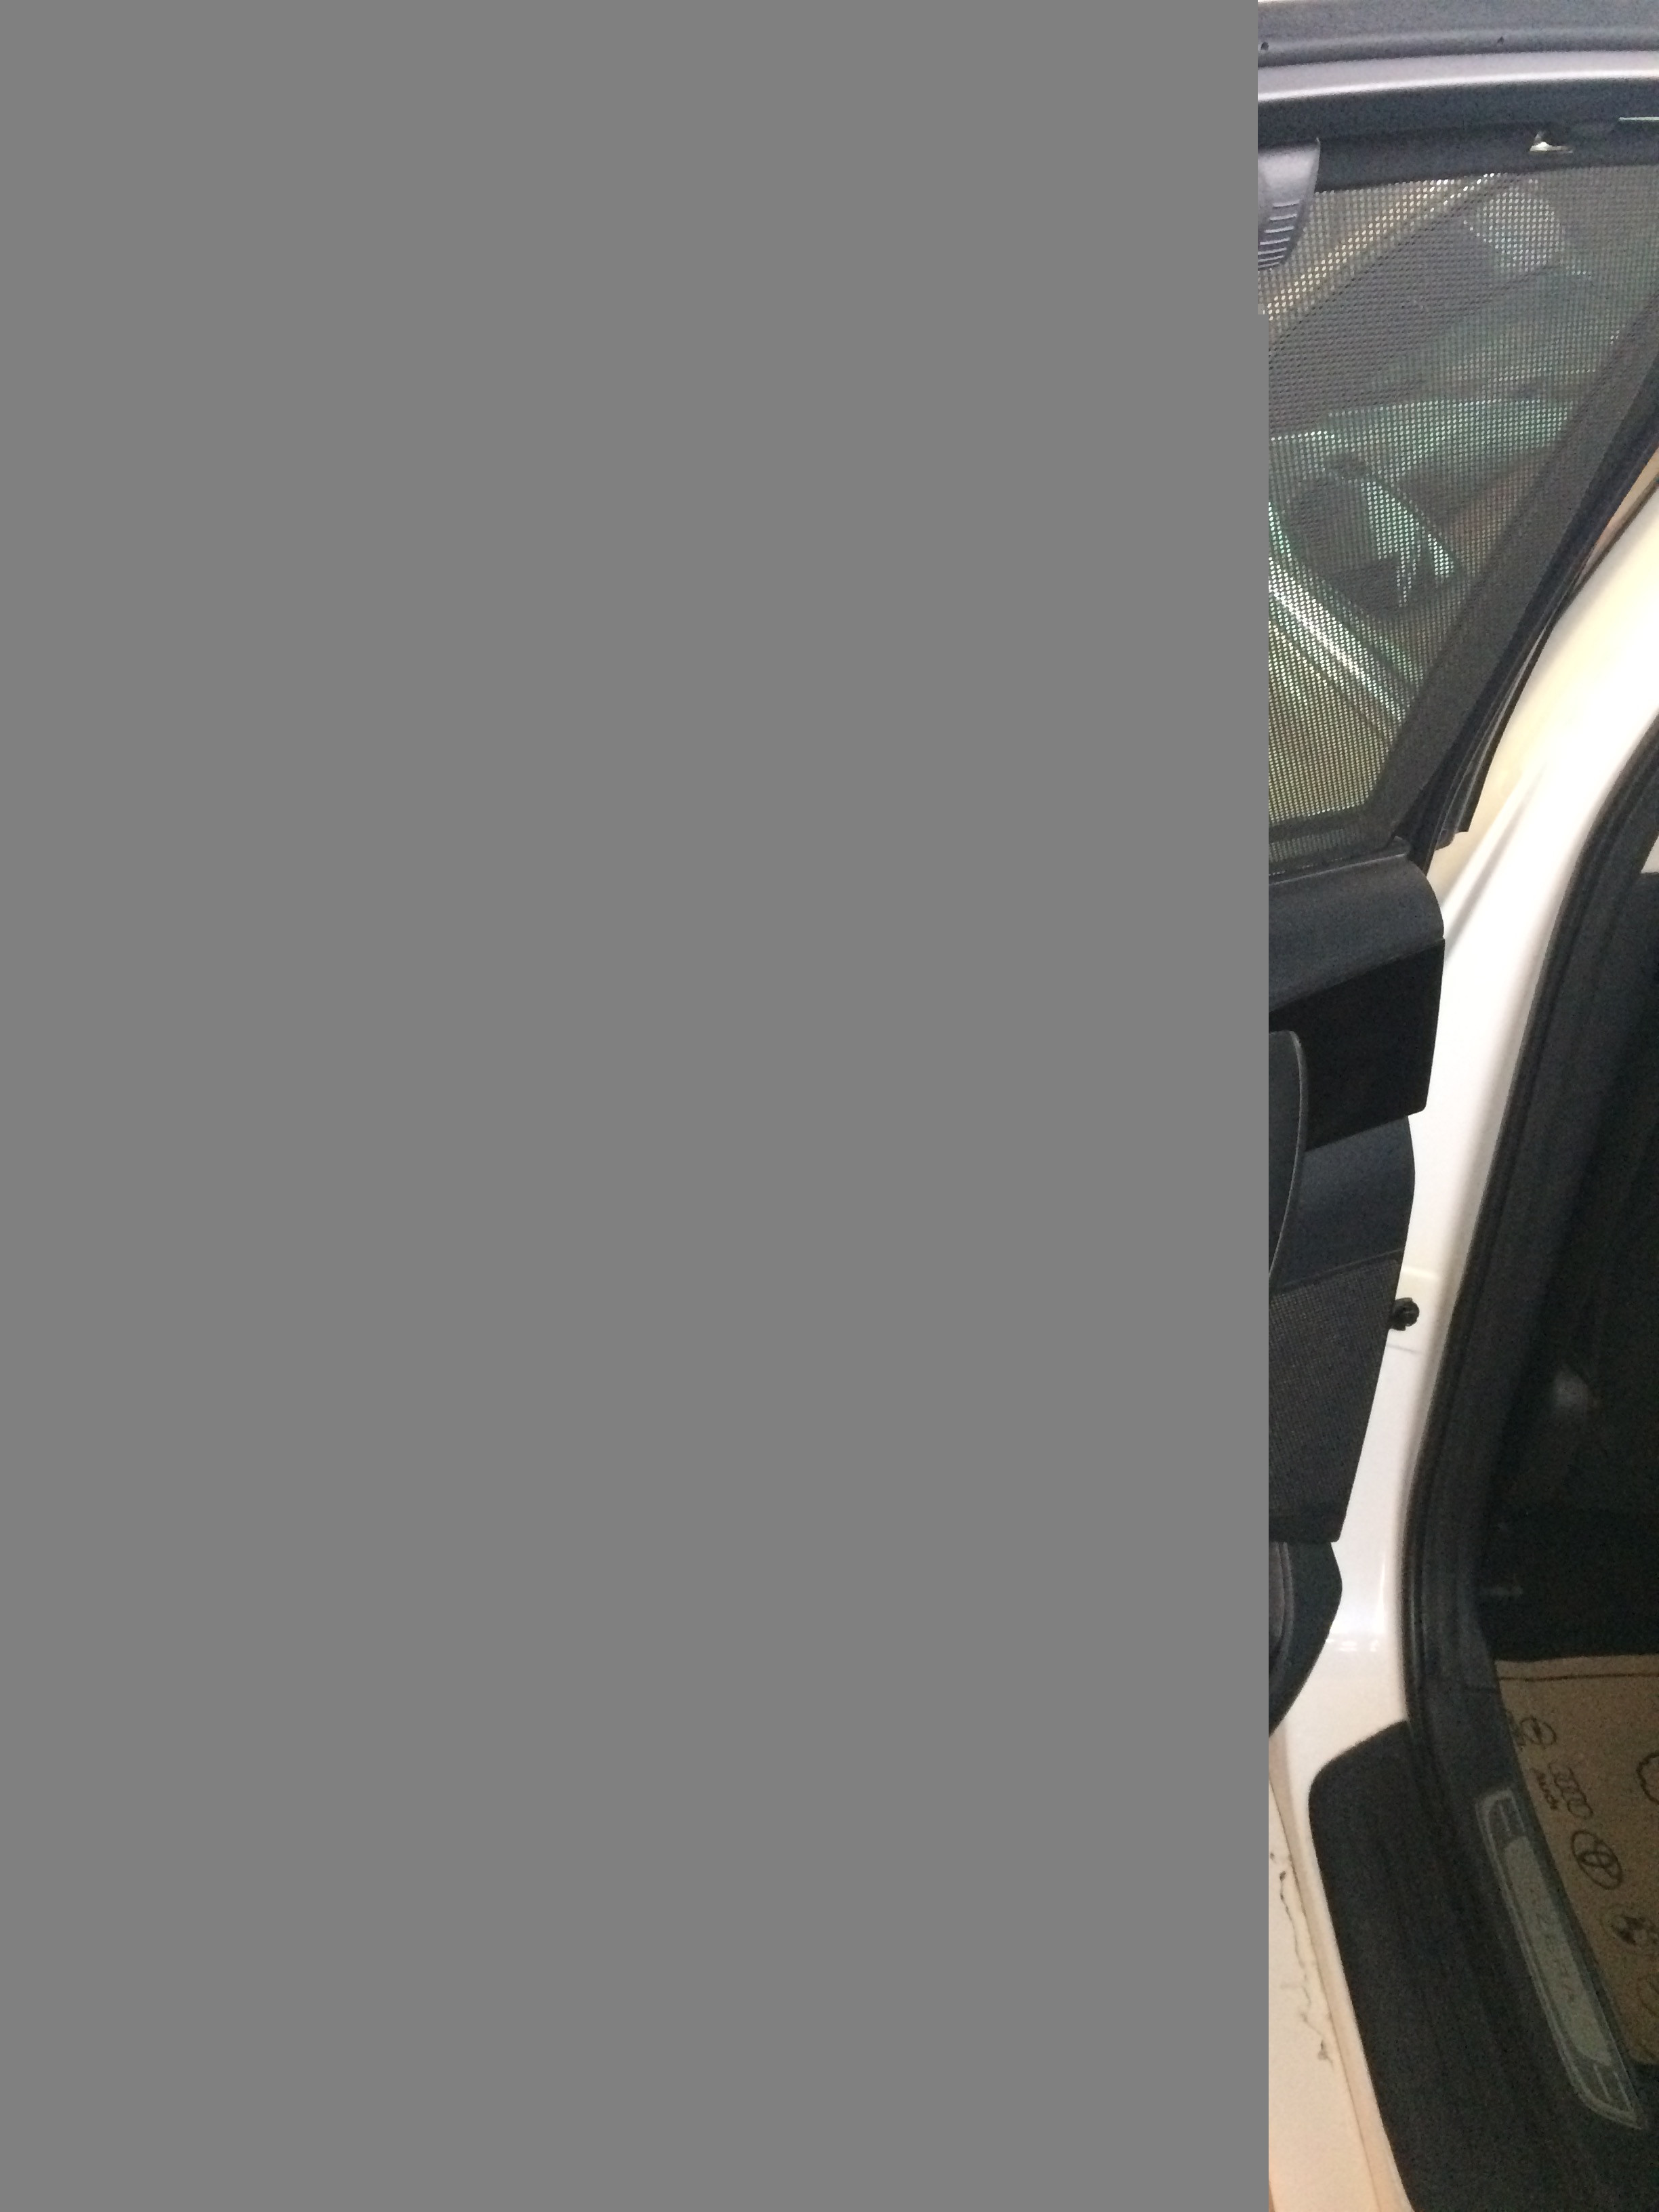 Hyundai Grandeur/Azera 2.4(lt) 2013 İkinci əl  $17300